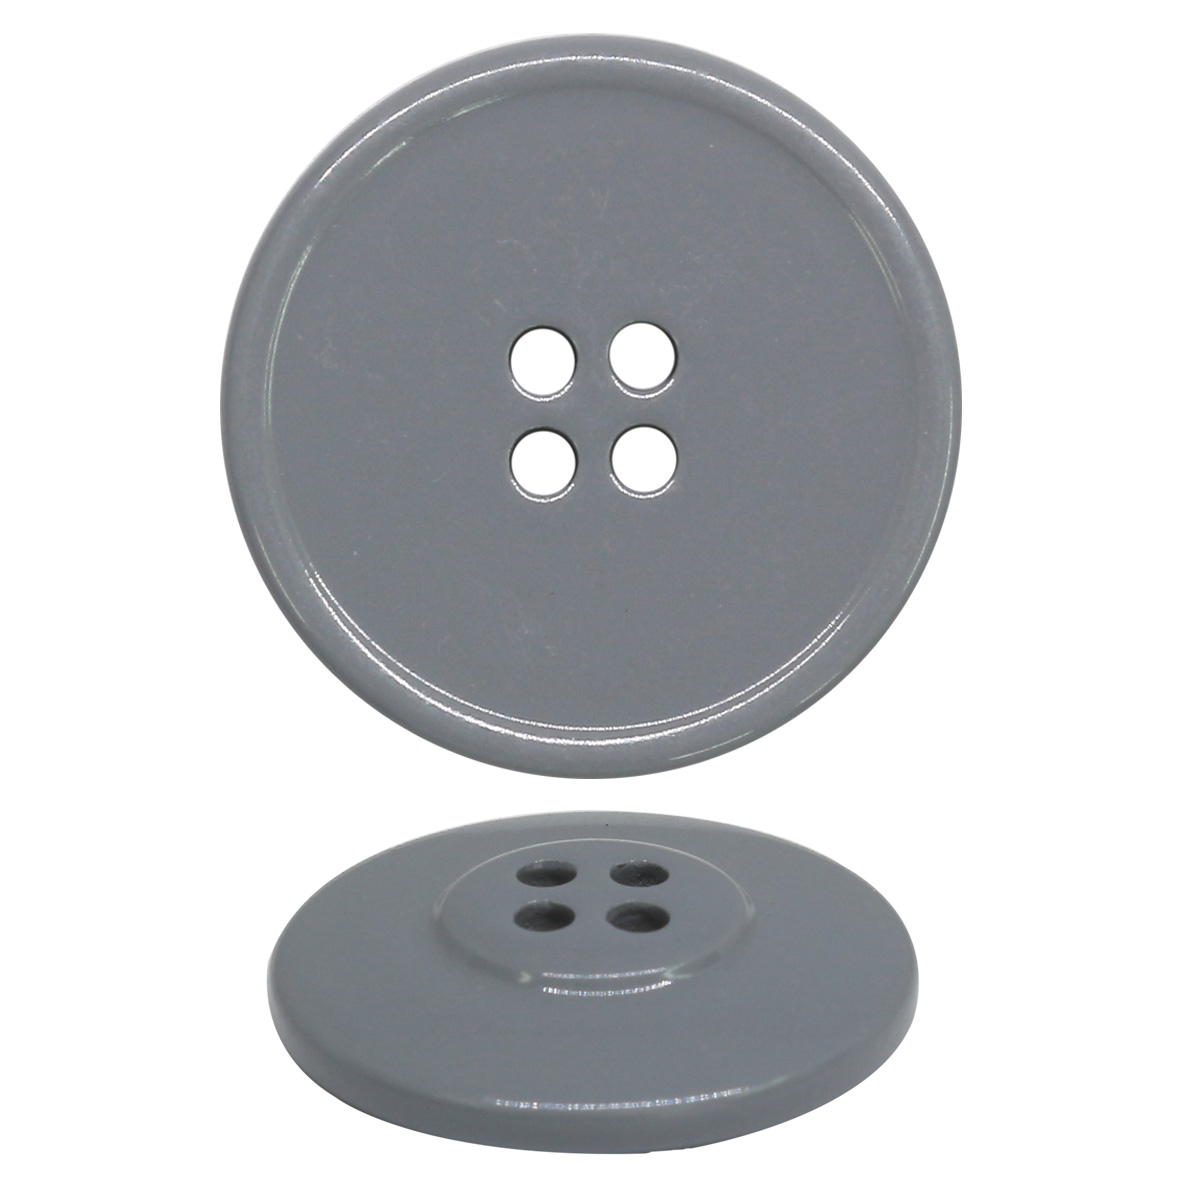 CB 3625 Пуговица 28L (07 (серый))